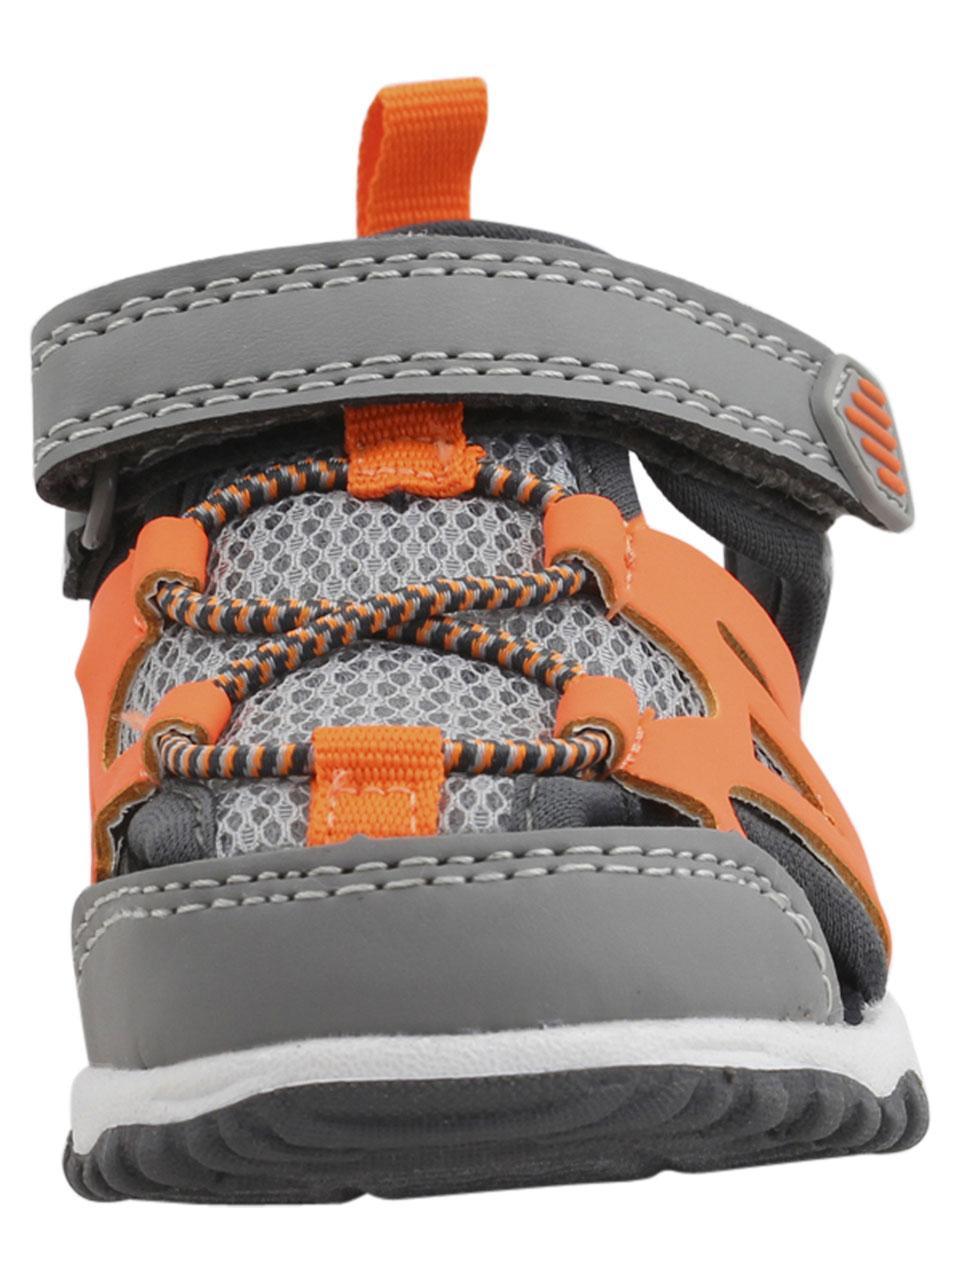 Carter-039-s-Toddler-Boy-039-s-Zyntec-B-Sandals-Shoes thumbnail 14